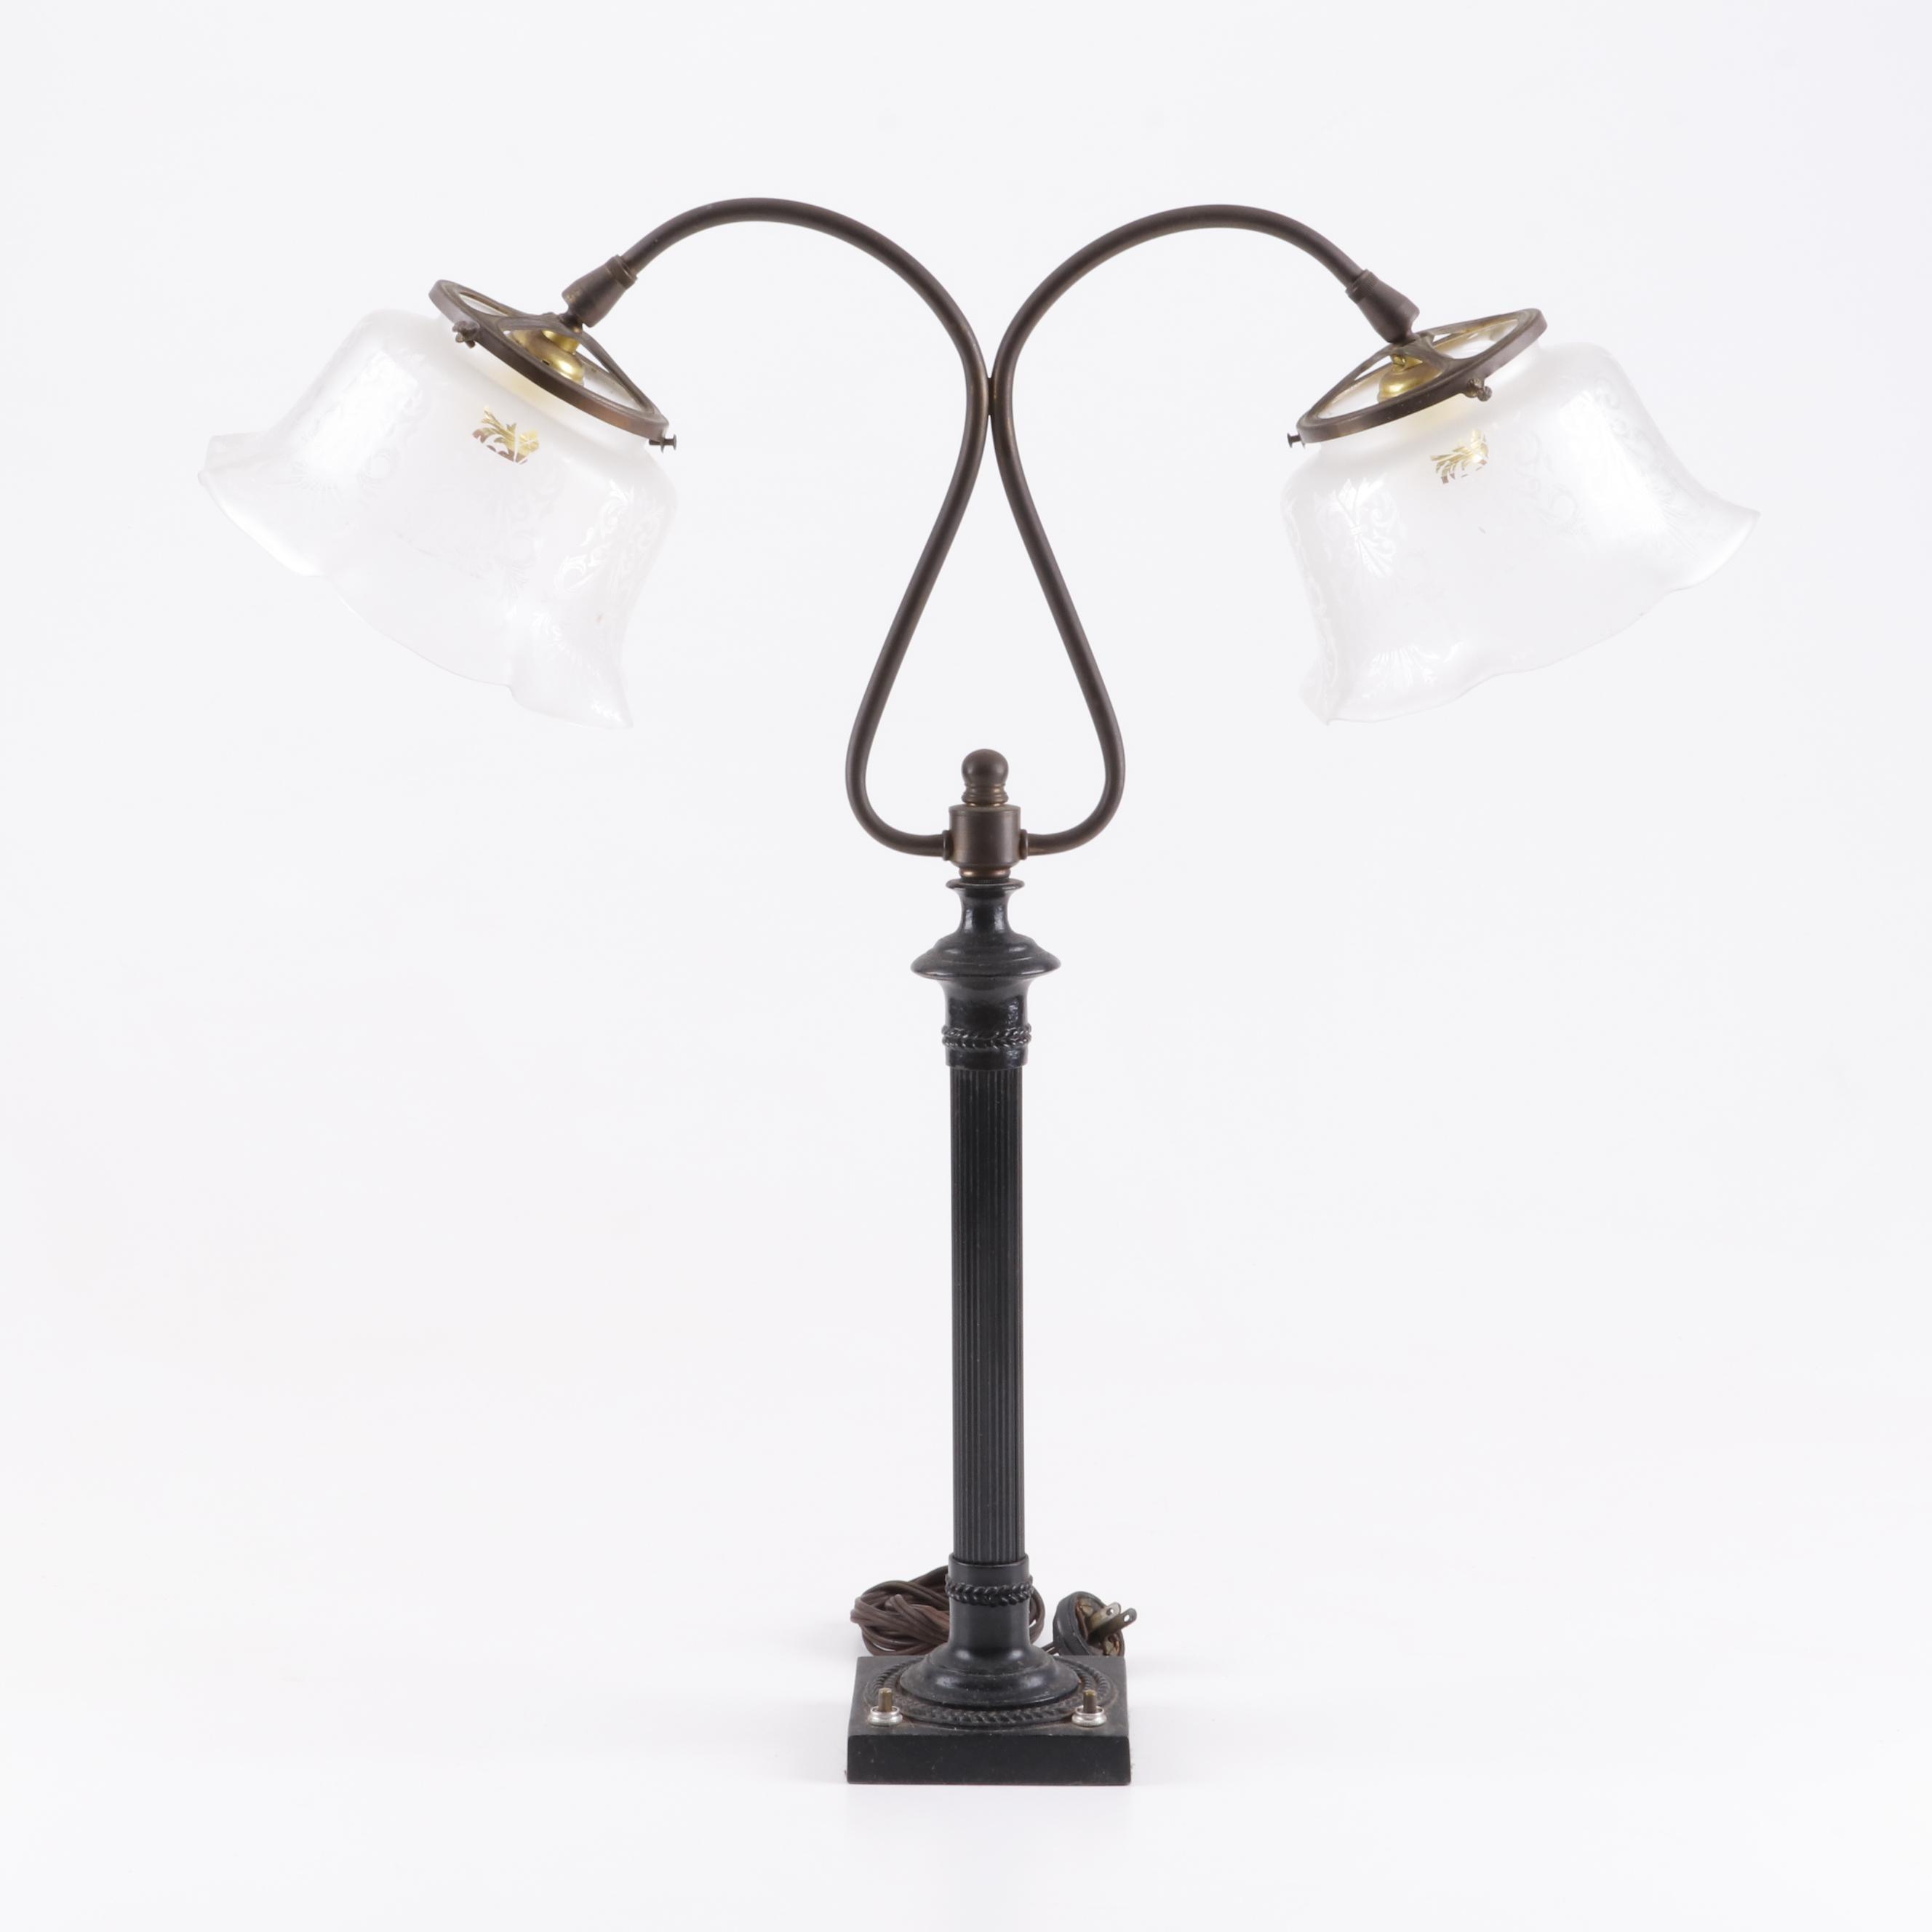 Art Deco Style Double Gooseneck Columnar Table Lamp